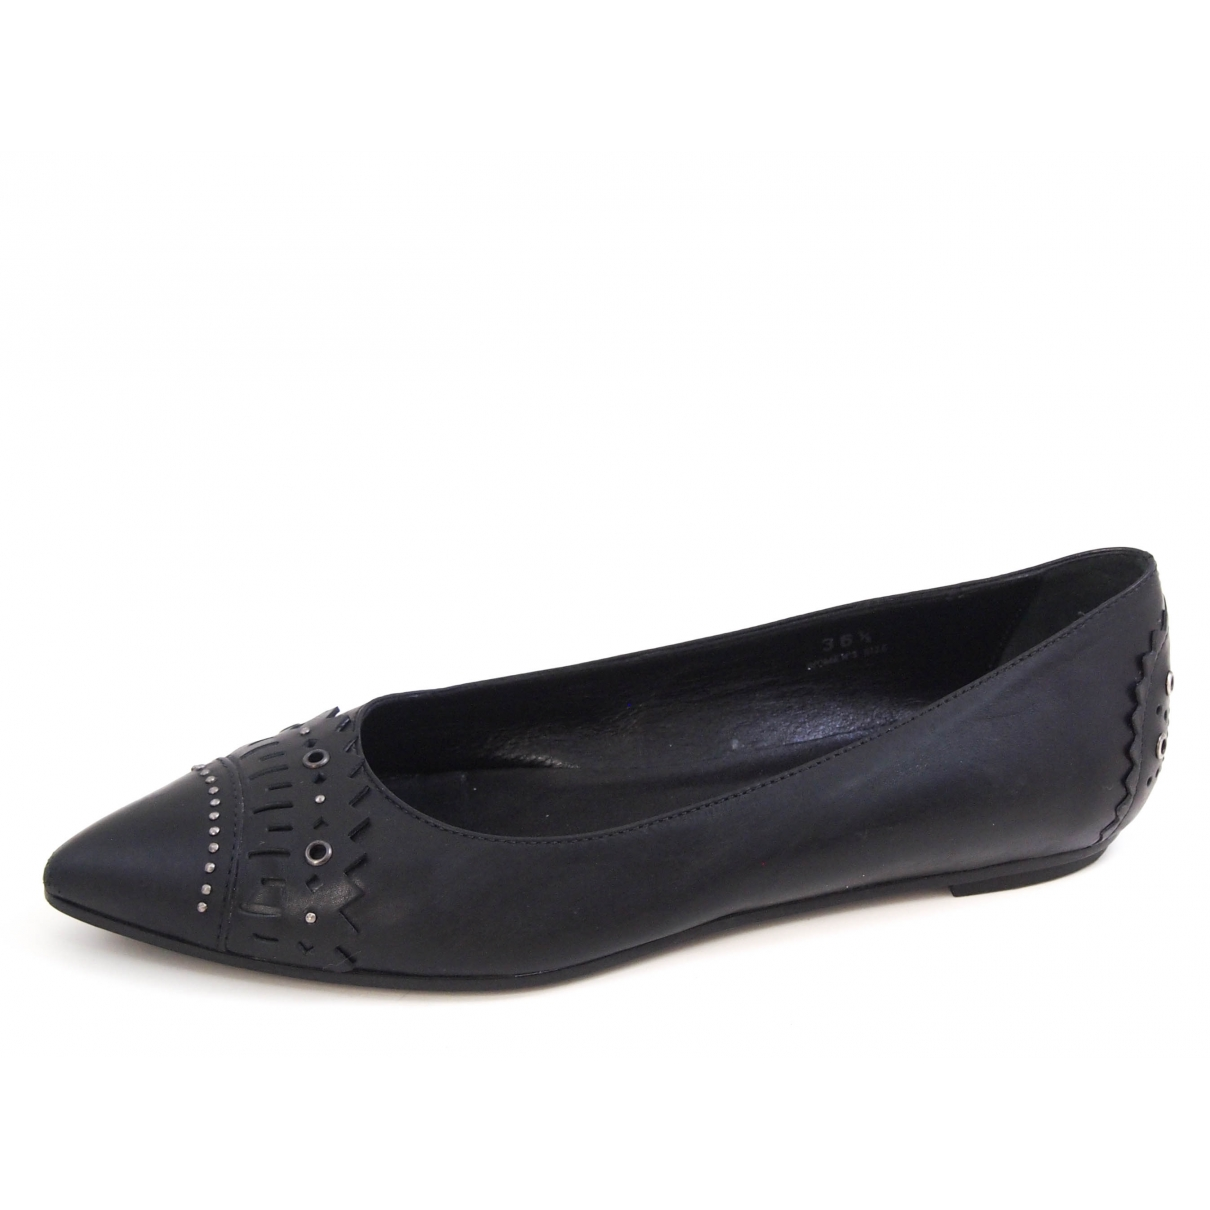 Tod's \N Black Leather Ballet flats for Women 36.5 EU